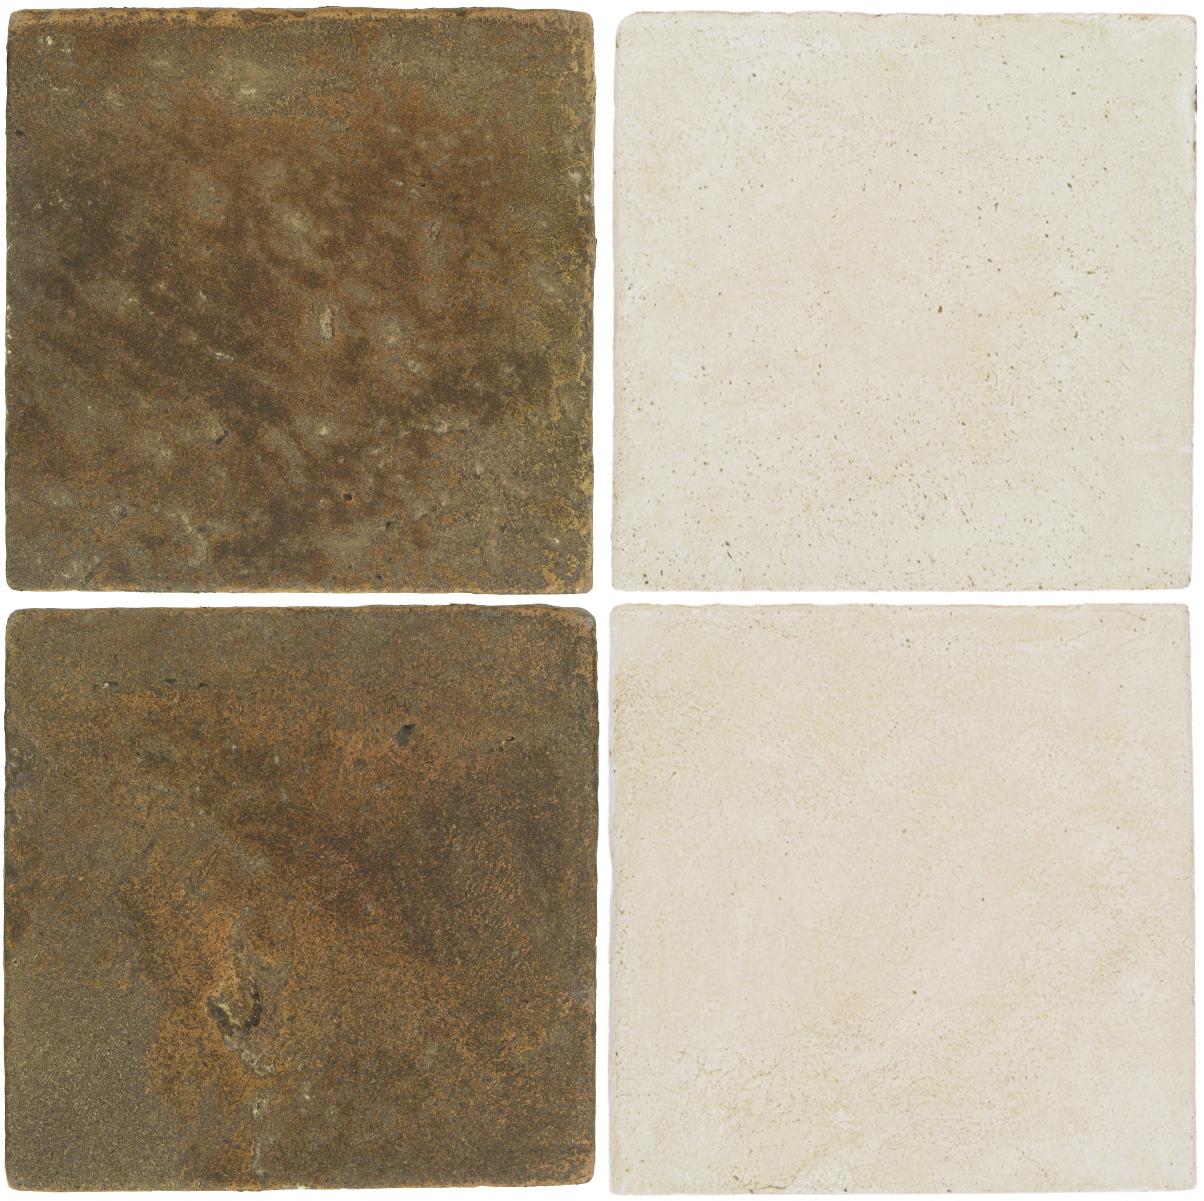 Pedralbes Antique Terracotta  2 Color Combinations  VTG-PSVN Verona Brown + OHS-PGAW Antique White